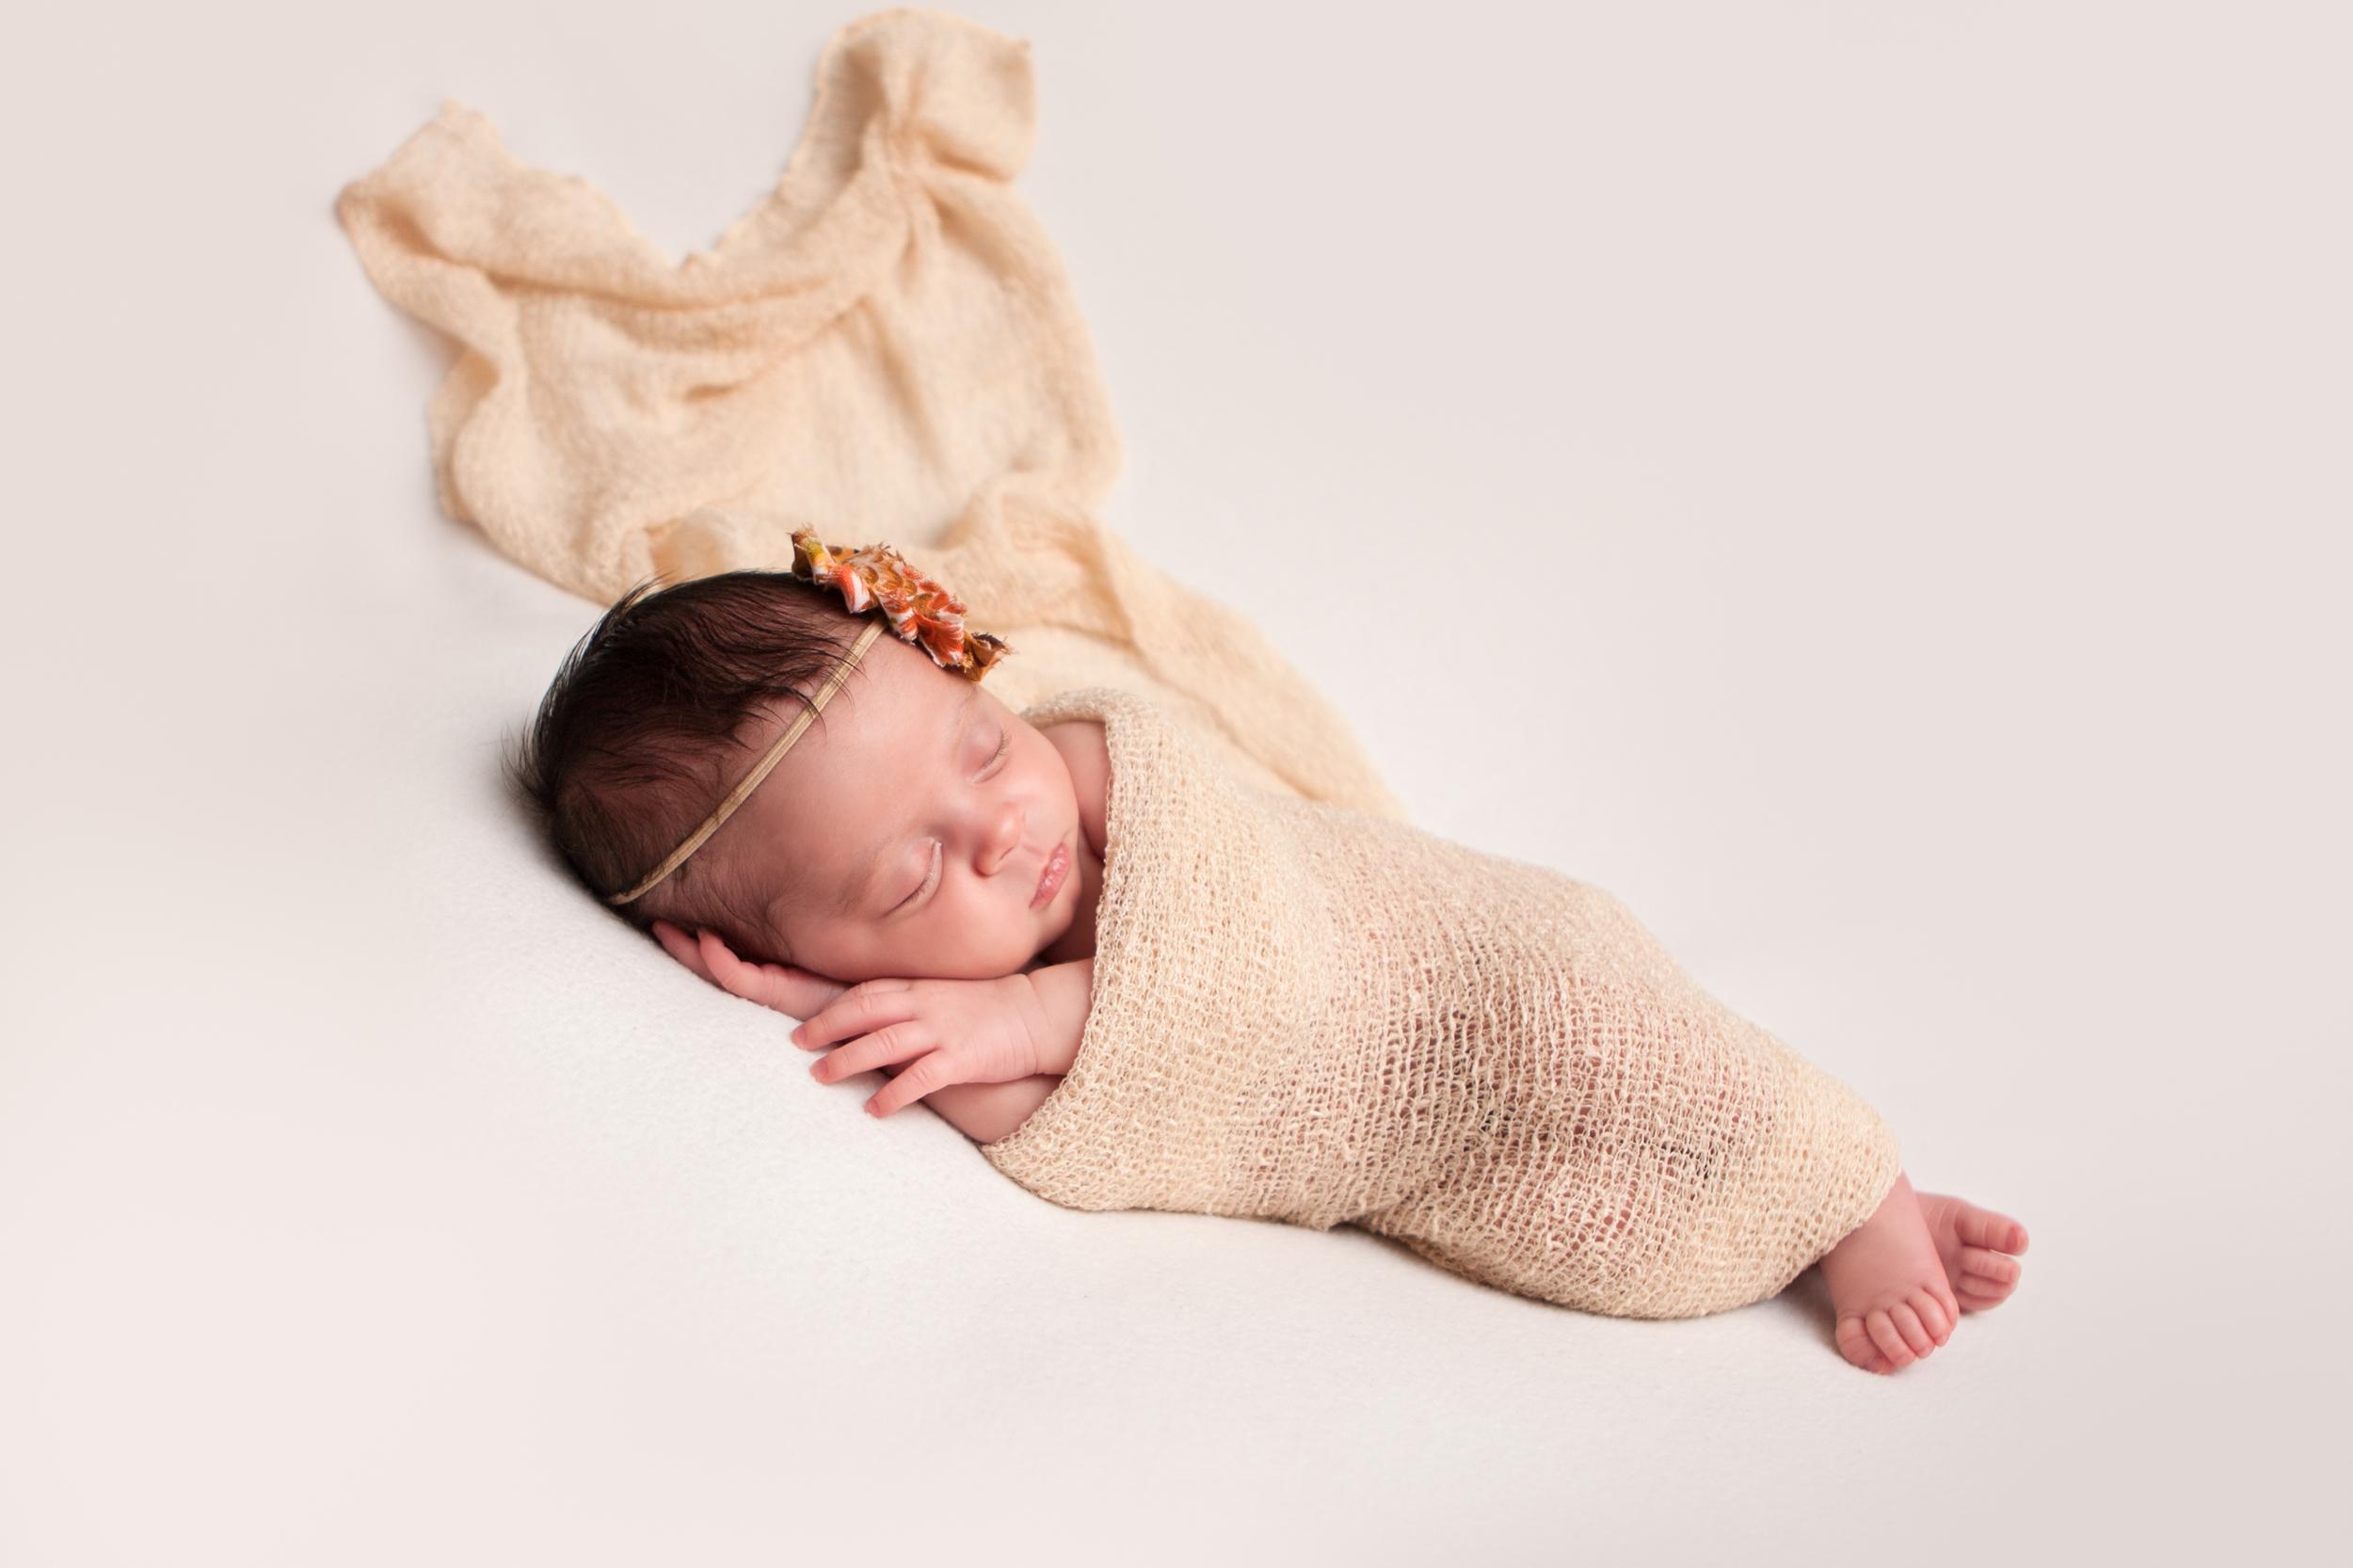 Newborn baby girl, shabby chic headband orange brown creme, creme white backdrop fabric blanket, creme tan stretch wrap, sleeping baby pose on beanbag, Westchester County, New Rochelle, White Plains, Pelham, New York Newborn Photographer, Amanda Noelle Photography